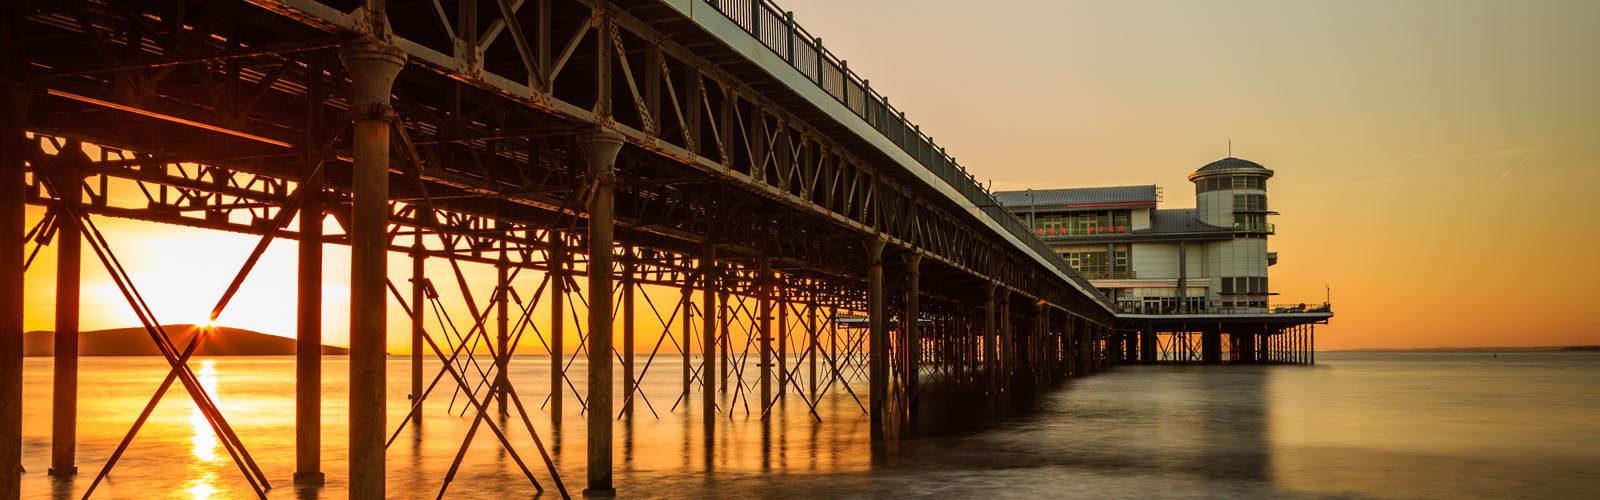 Weston-super-Mare pier at sunset.